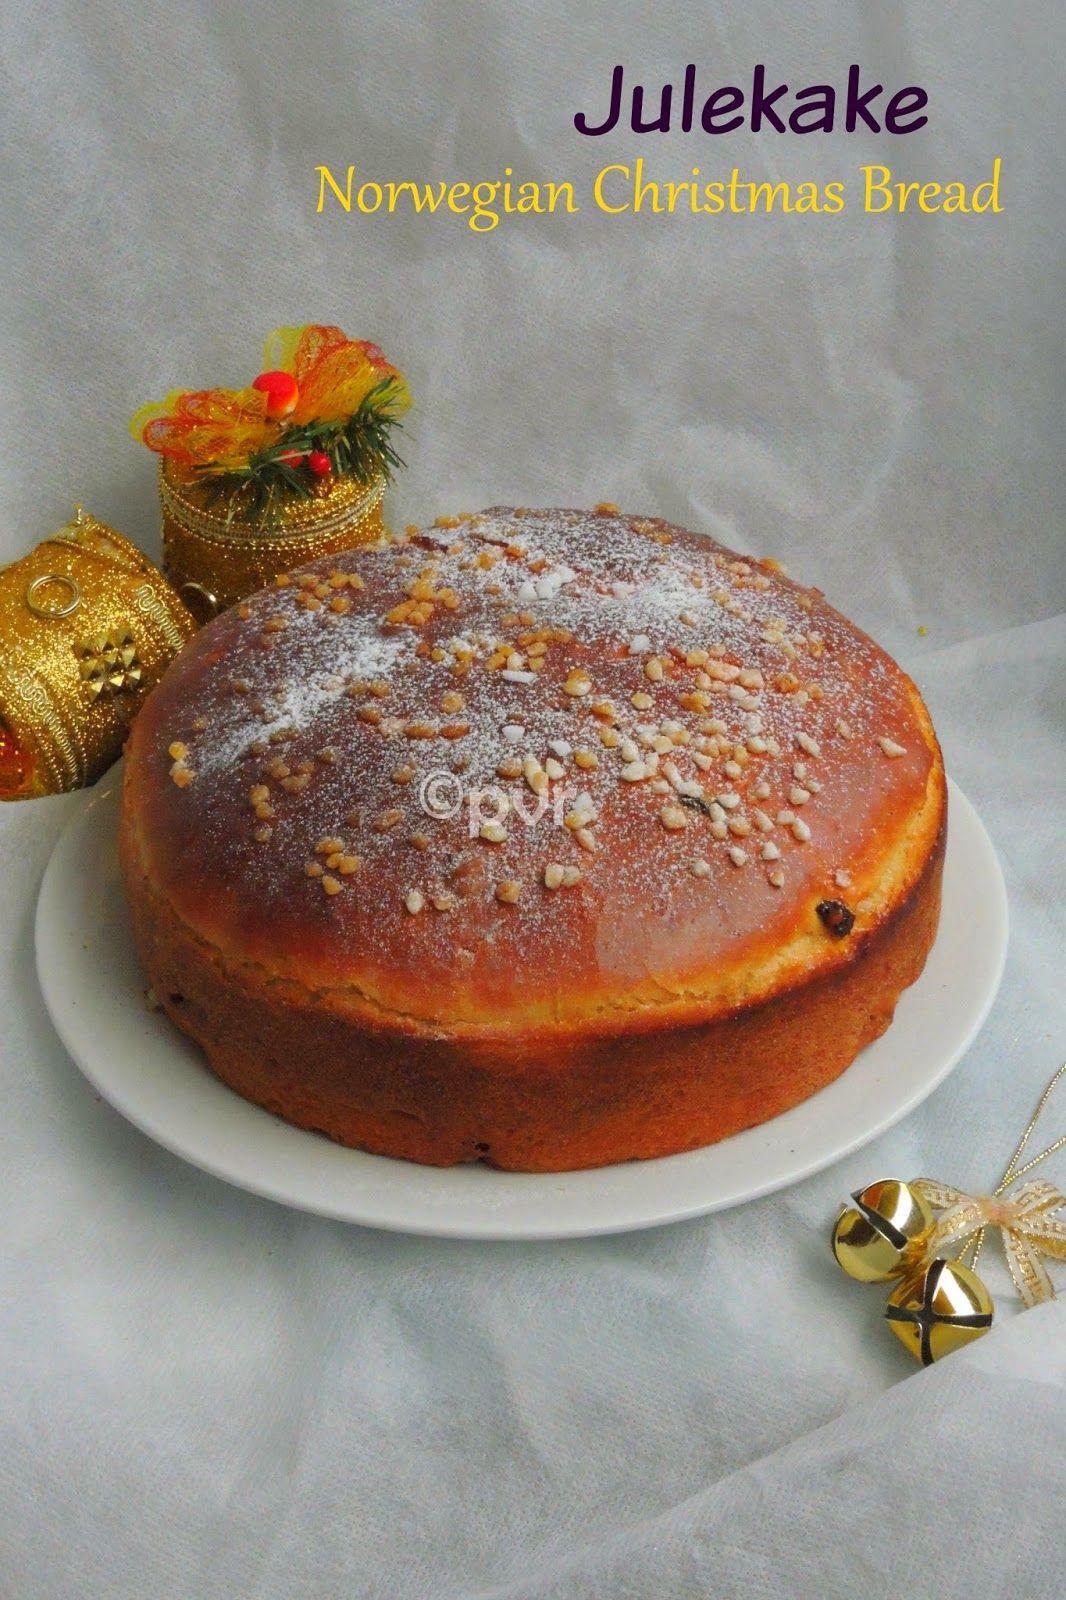 Julekake Version 2 - A Norwegian Christmas Bread | Bread, Roti ...